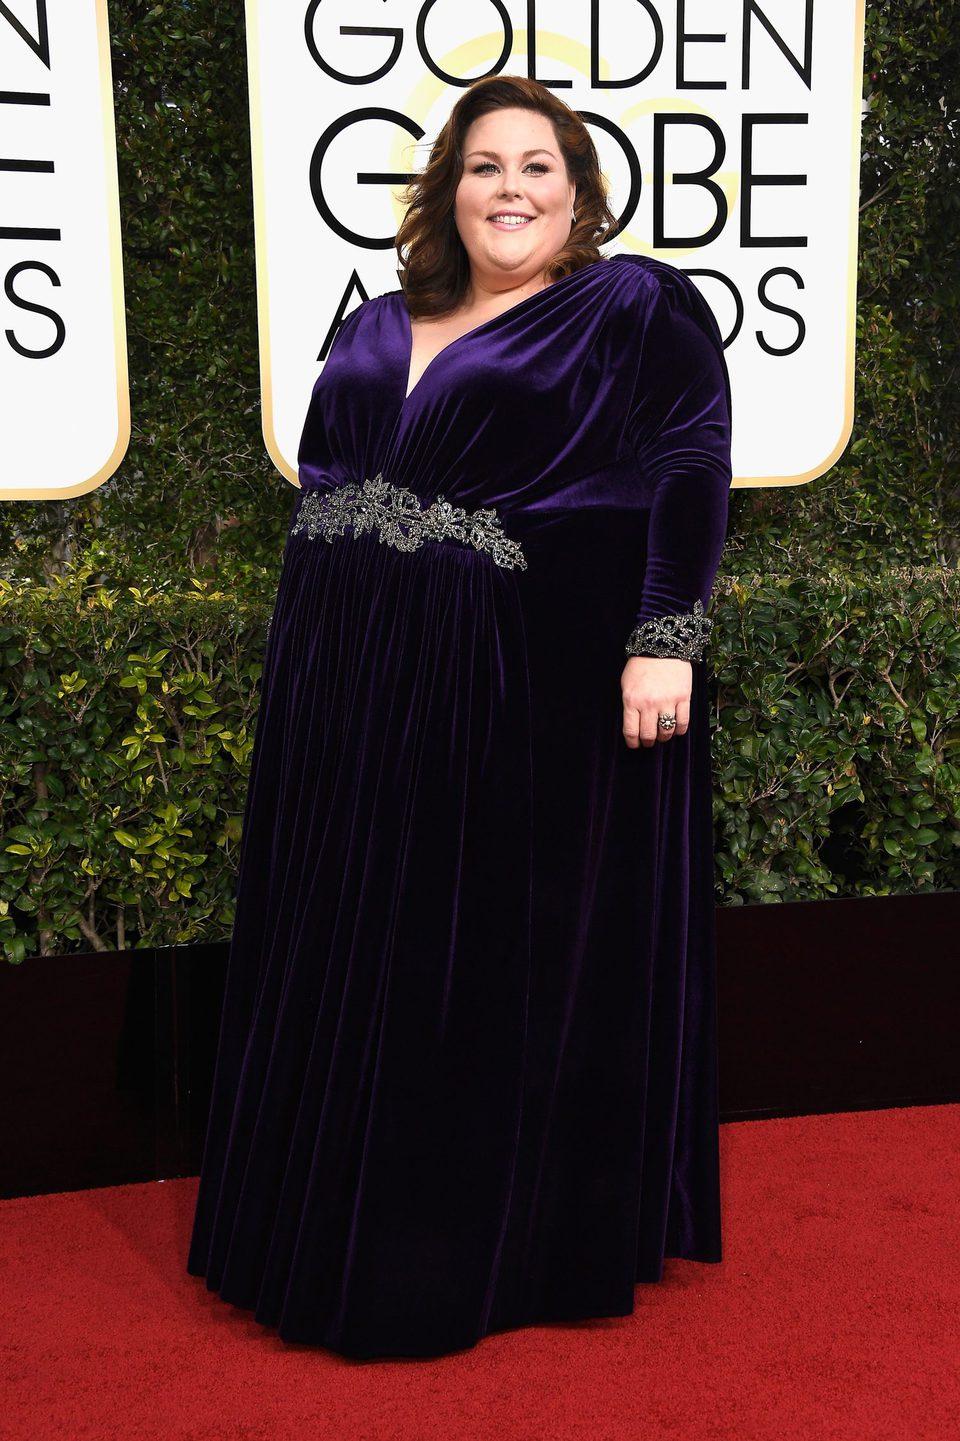 Chrissy Metz at Golden Globes 2017 red carpet